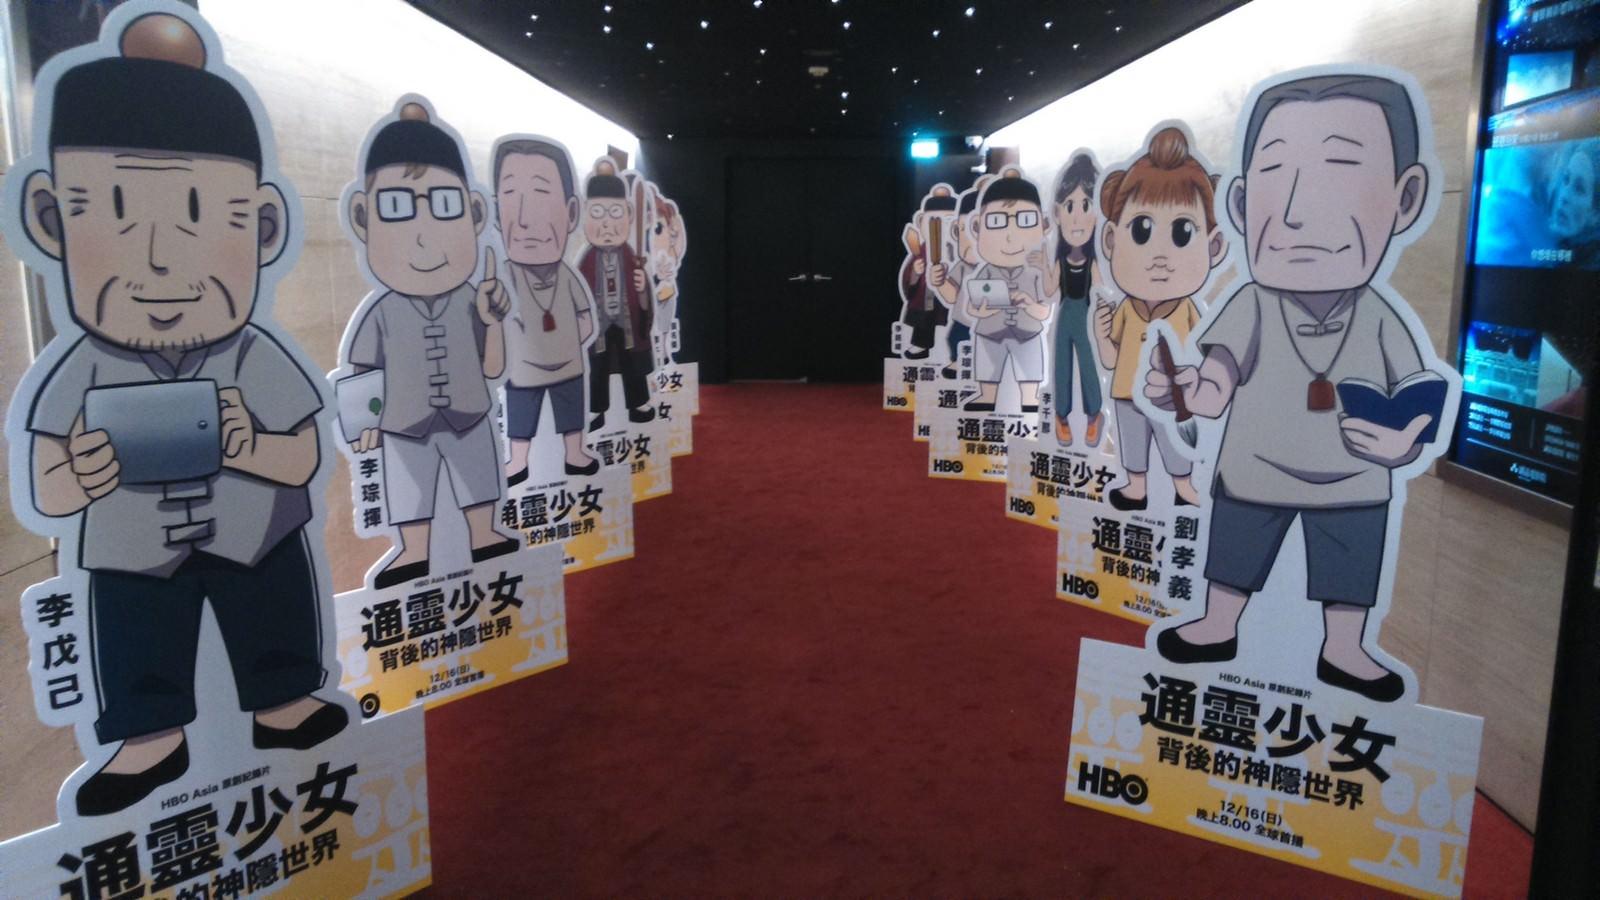 Movie, 通靈少女背後的神隱世界(台灣, 2018年) / The World Behind the Teenage Psychic(英文), 廣告看板(特映會)